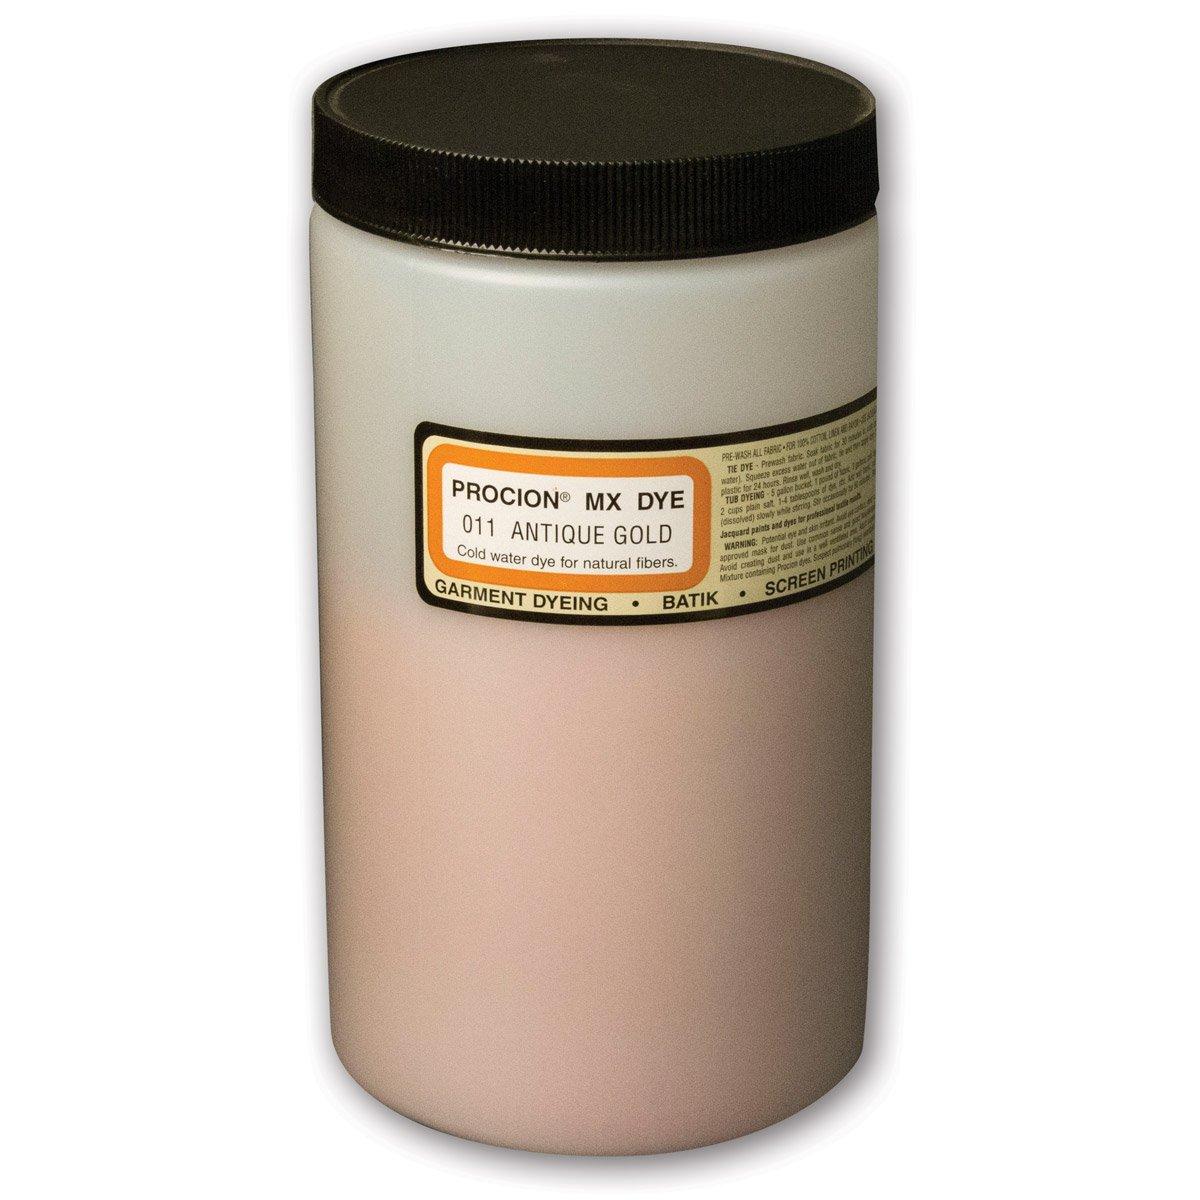 Procion Mx Dye Antique Gold 1 Lb RUPERT GIBBONS & SPIDER